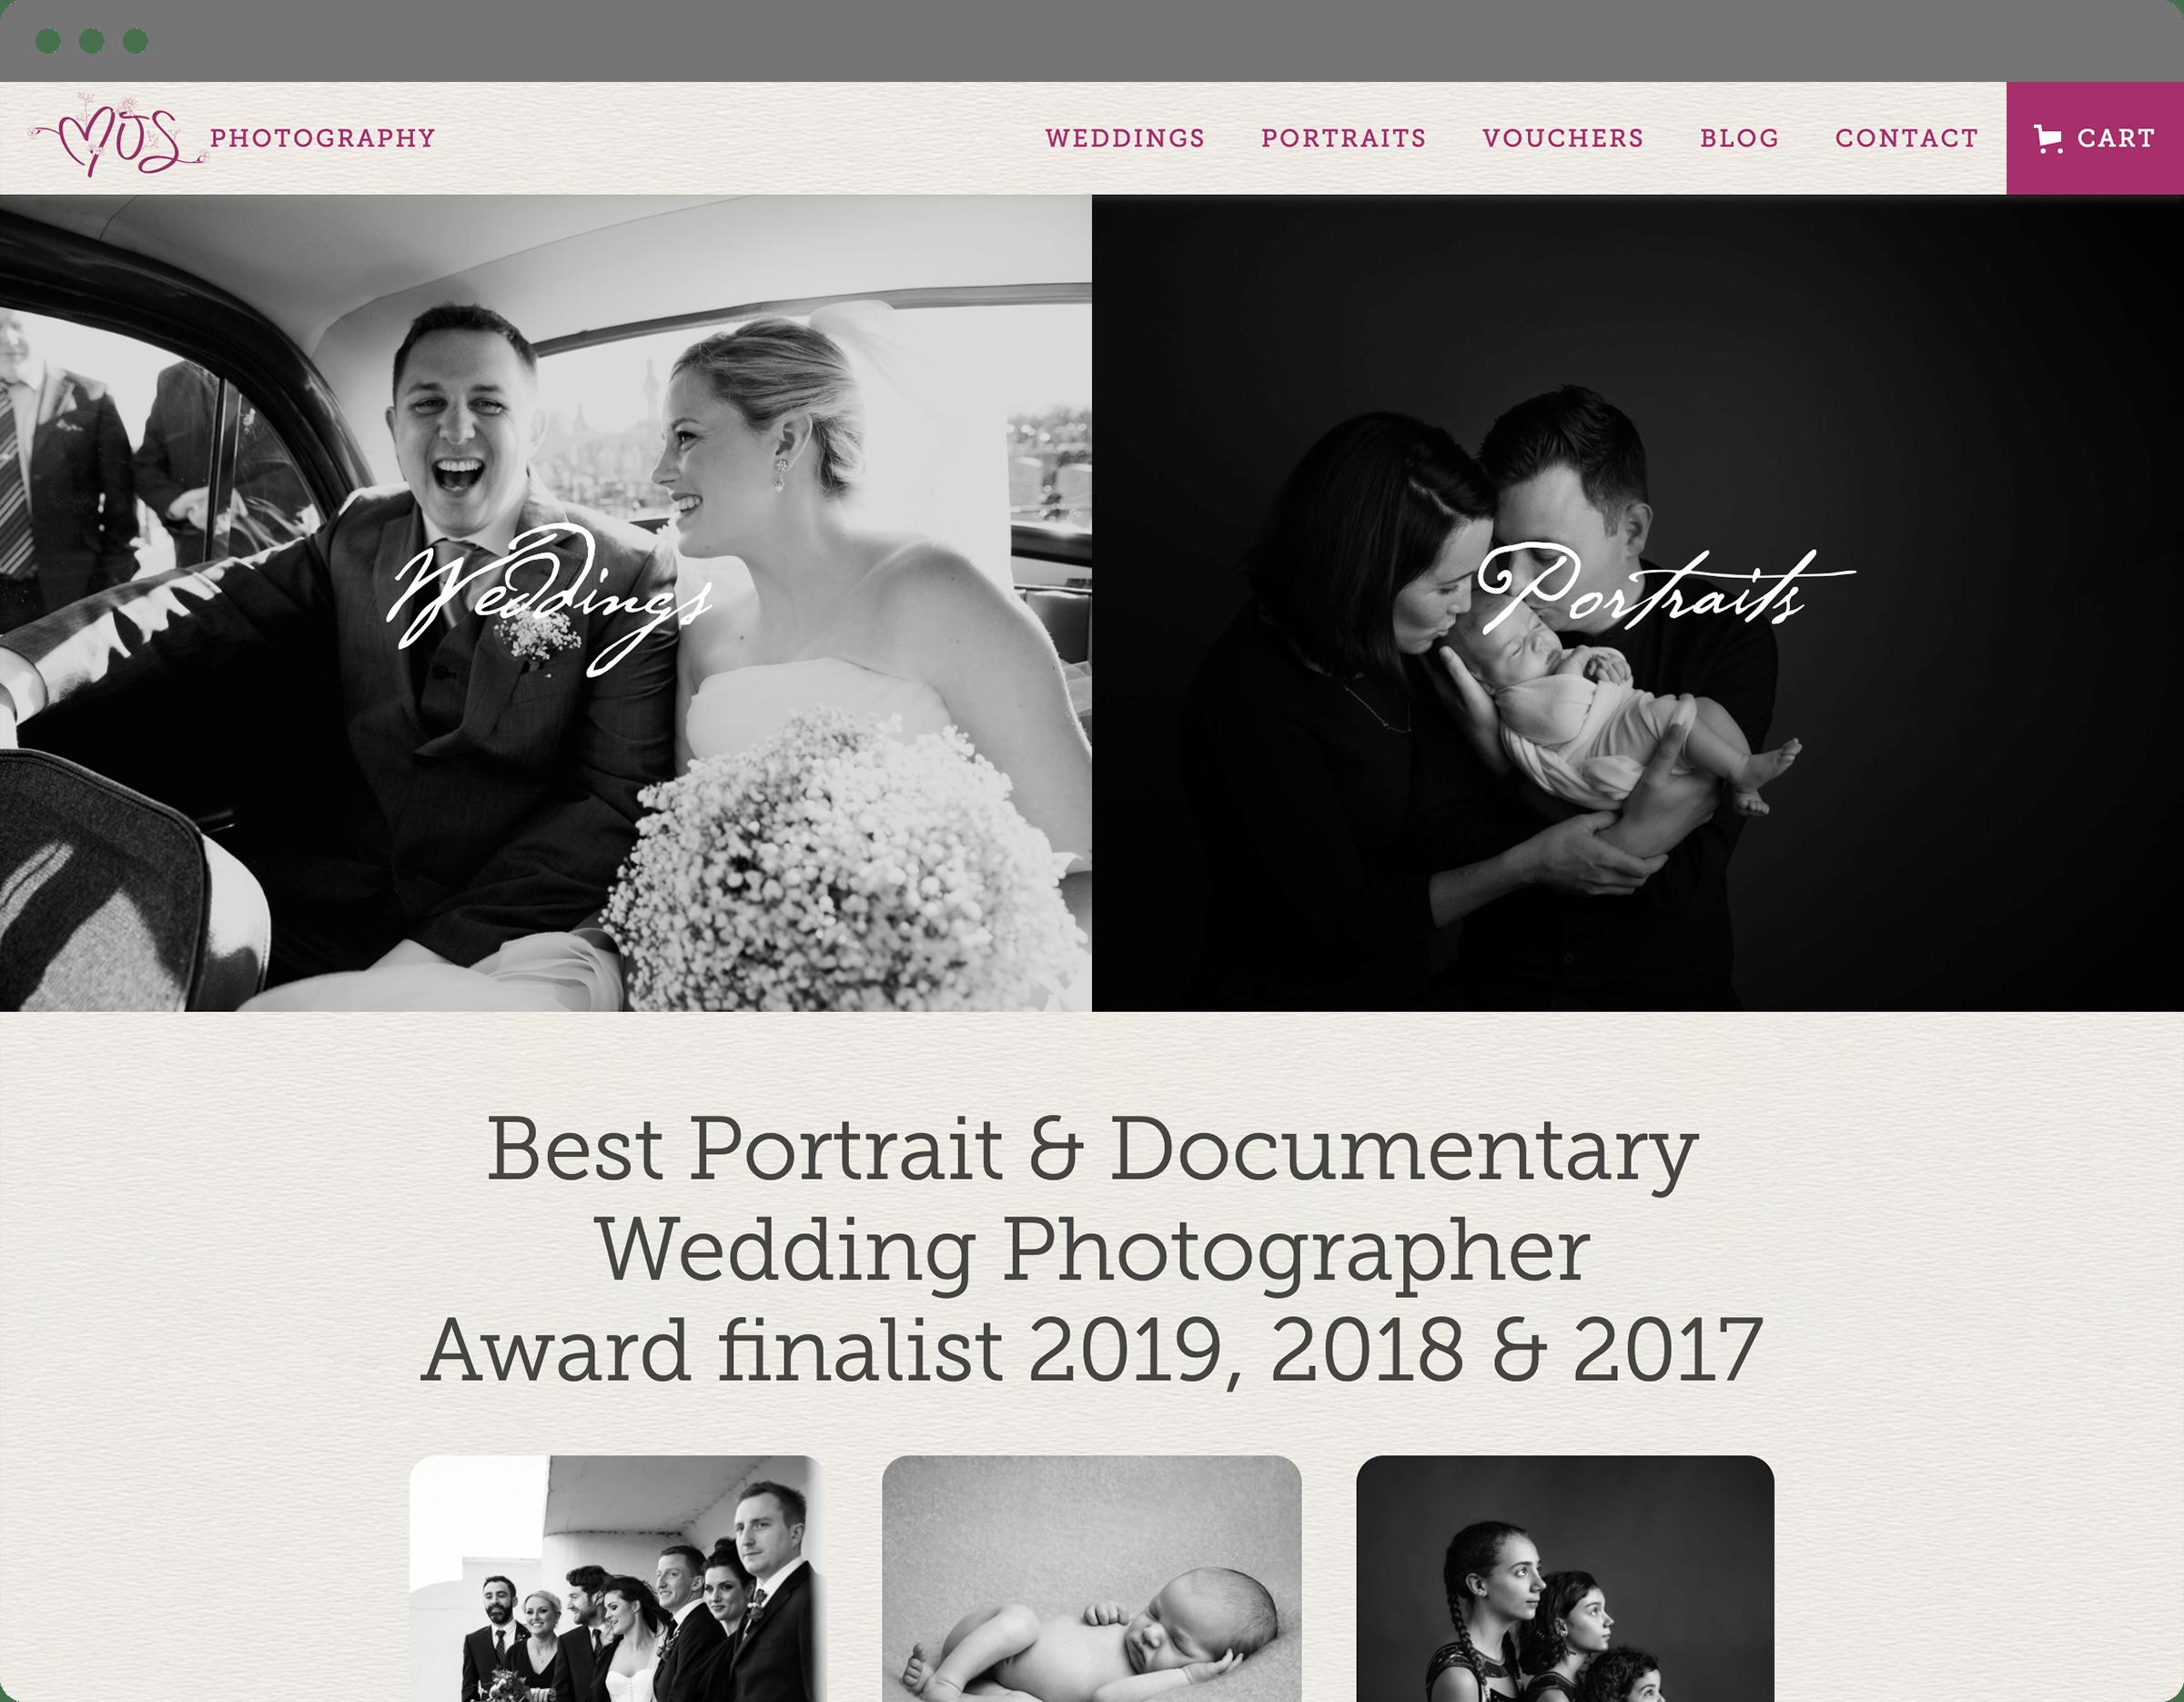 Website Design - Home Page